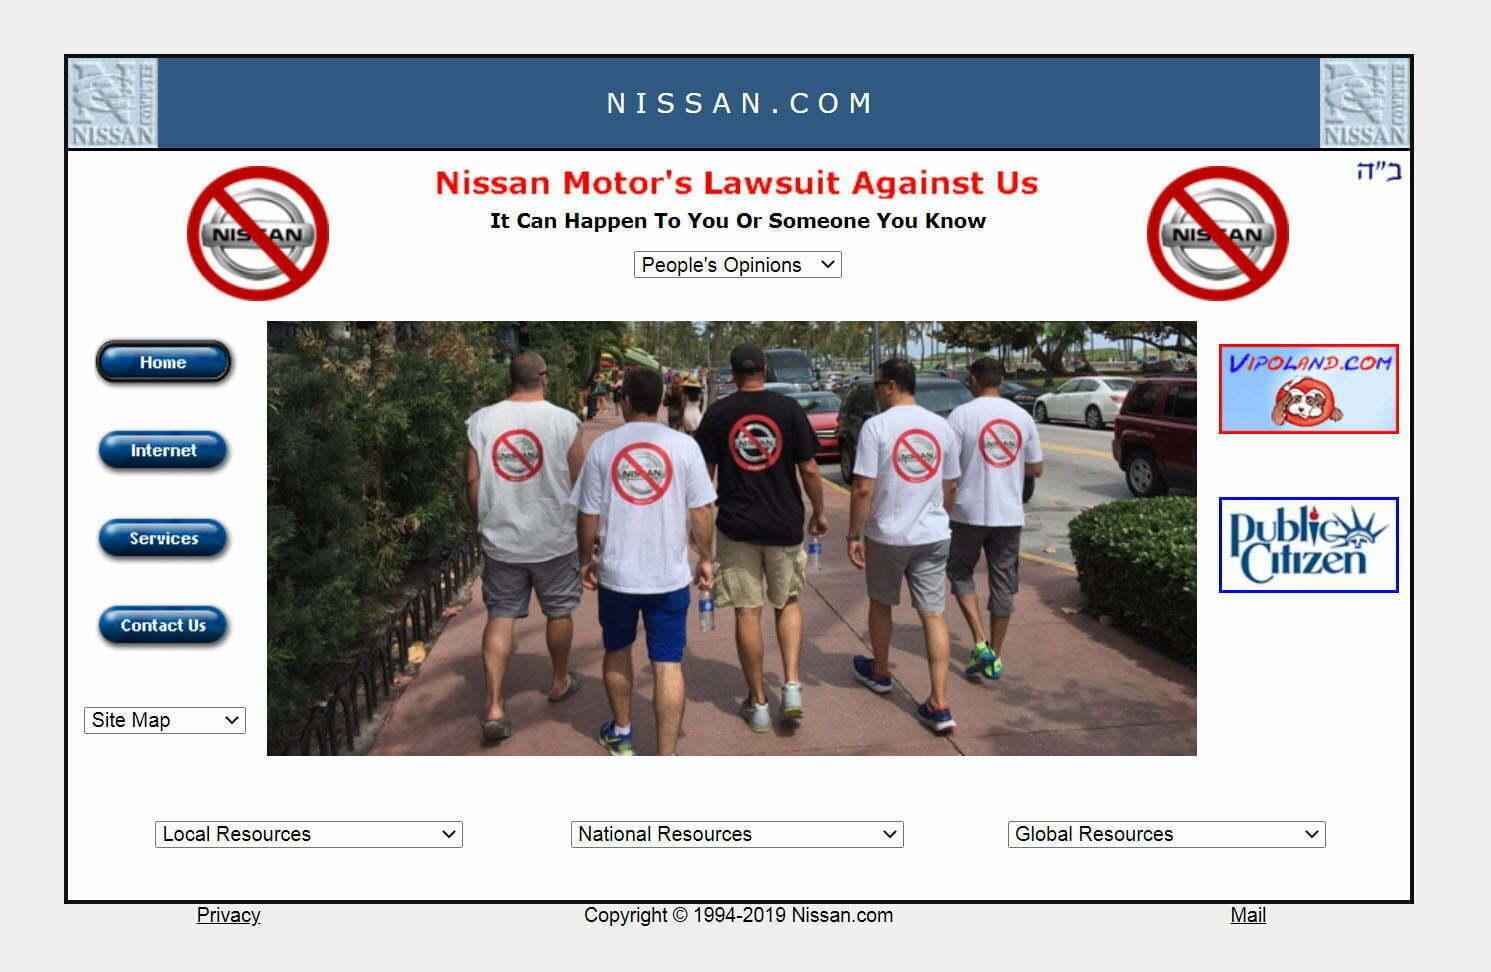 אתר האינטרנט של עוזי ניסן, Nissan.com